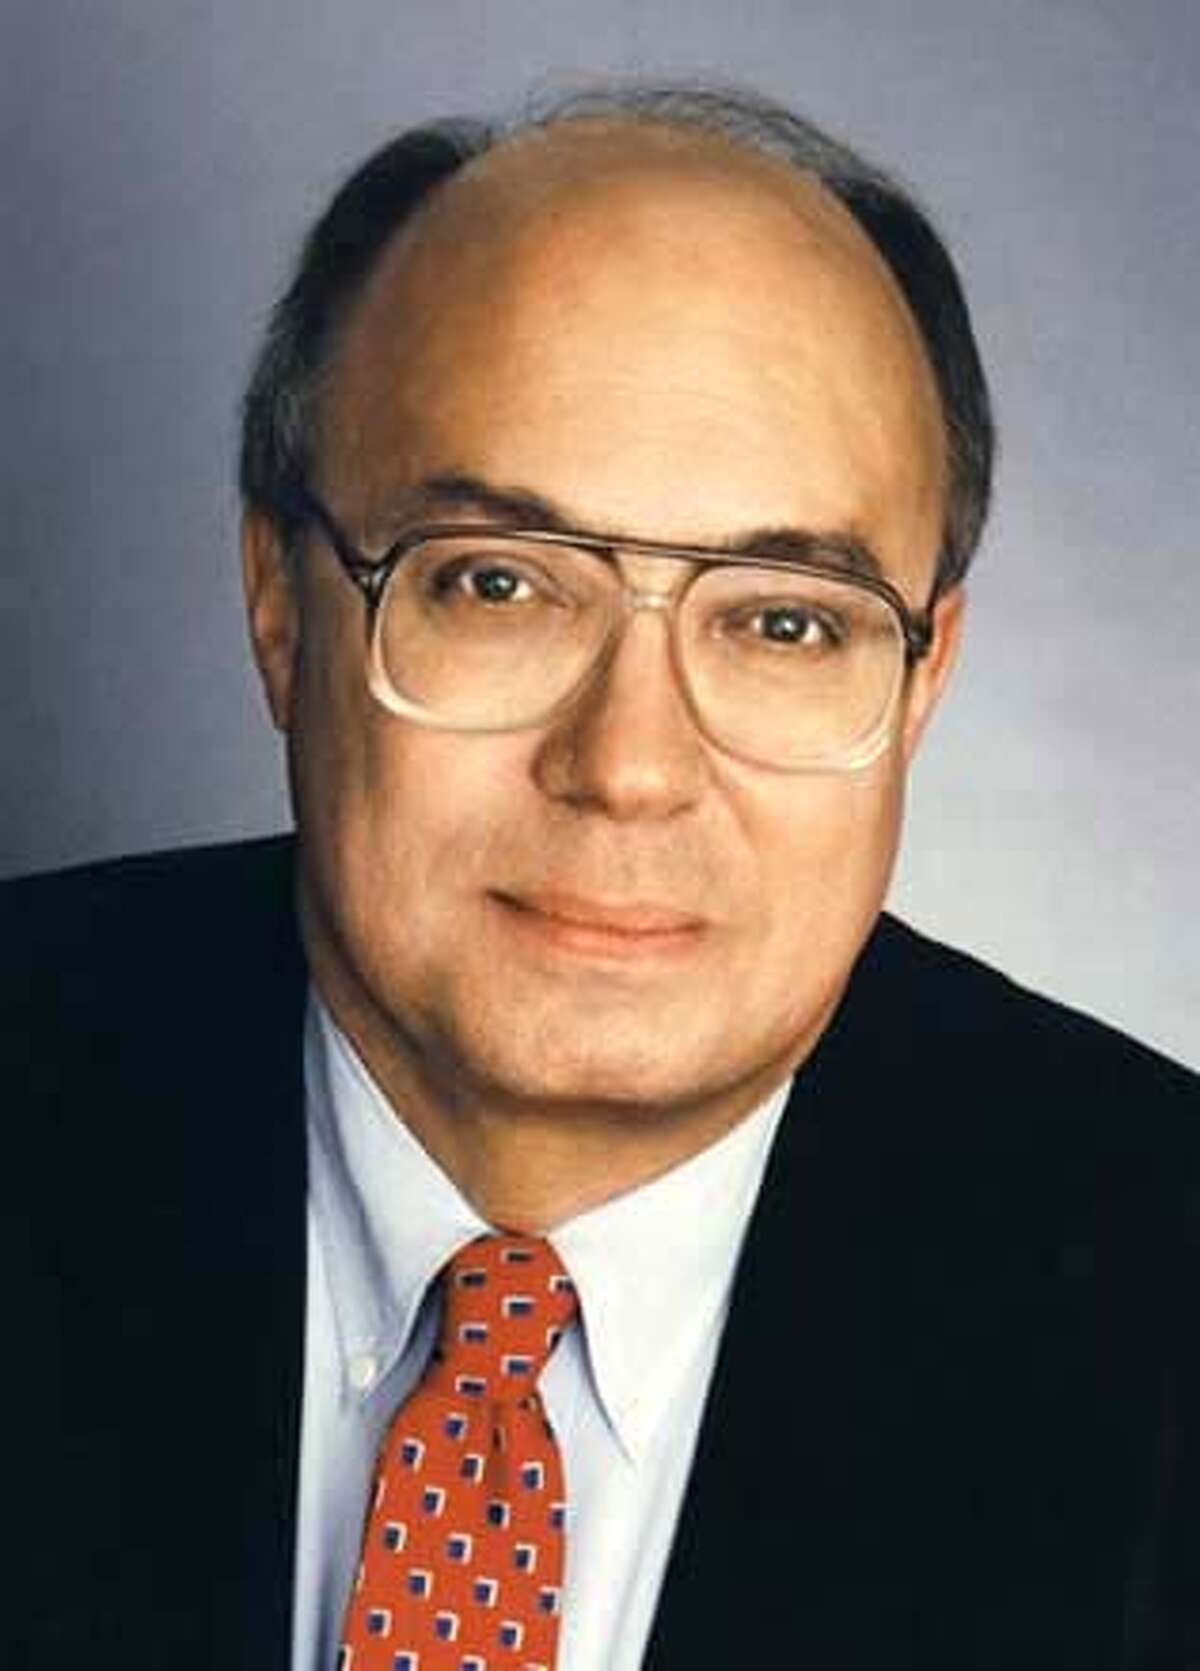 California State Senator Joe Simitian (D-Palo Alto) recently updated his headshots for 2006.